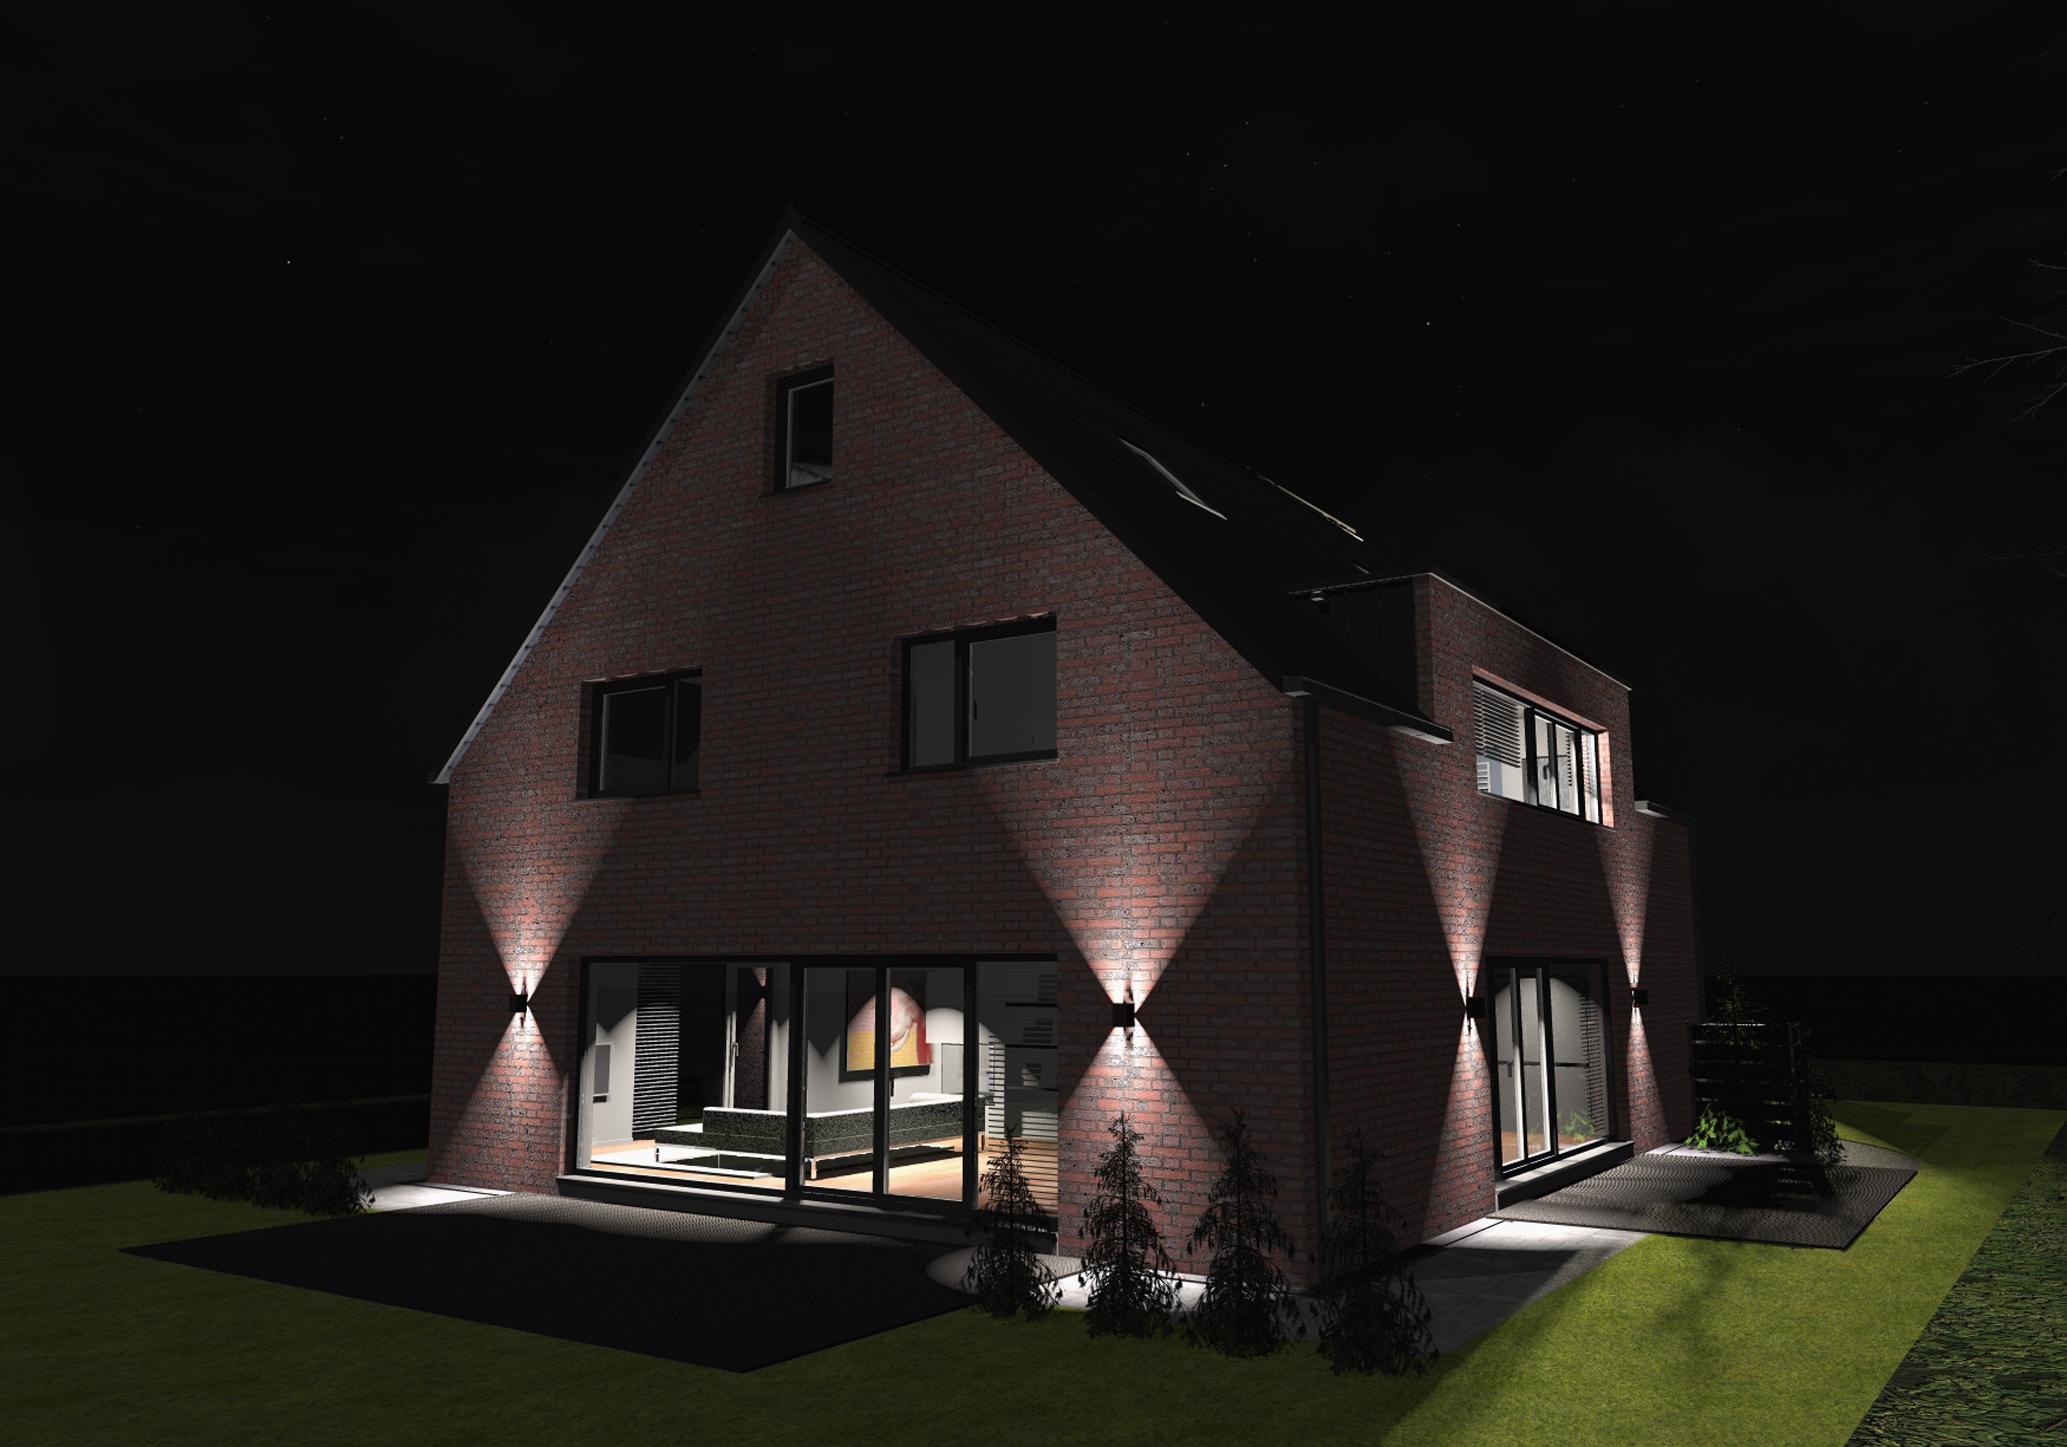 https://jost-planung.de/wp-content/uploads/2021/01/Hattrup3D_Haus_Haus008.jpg